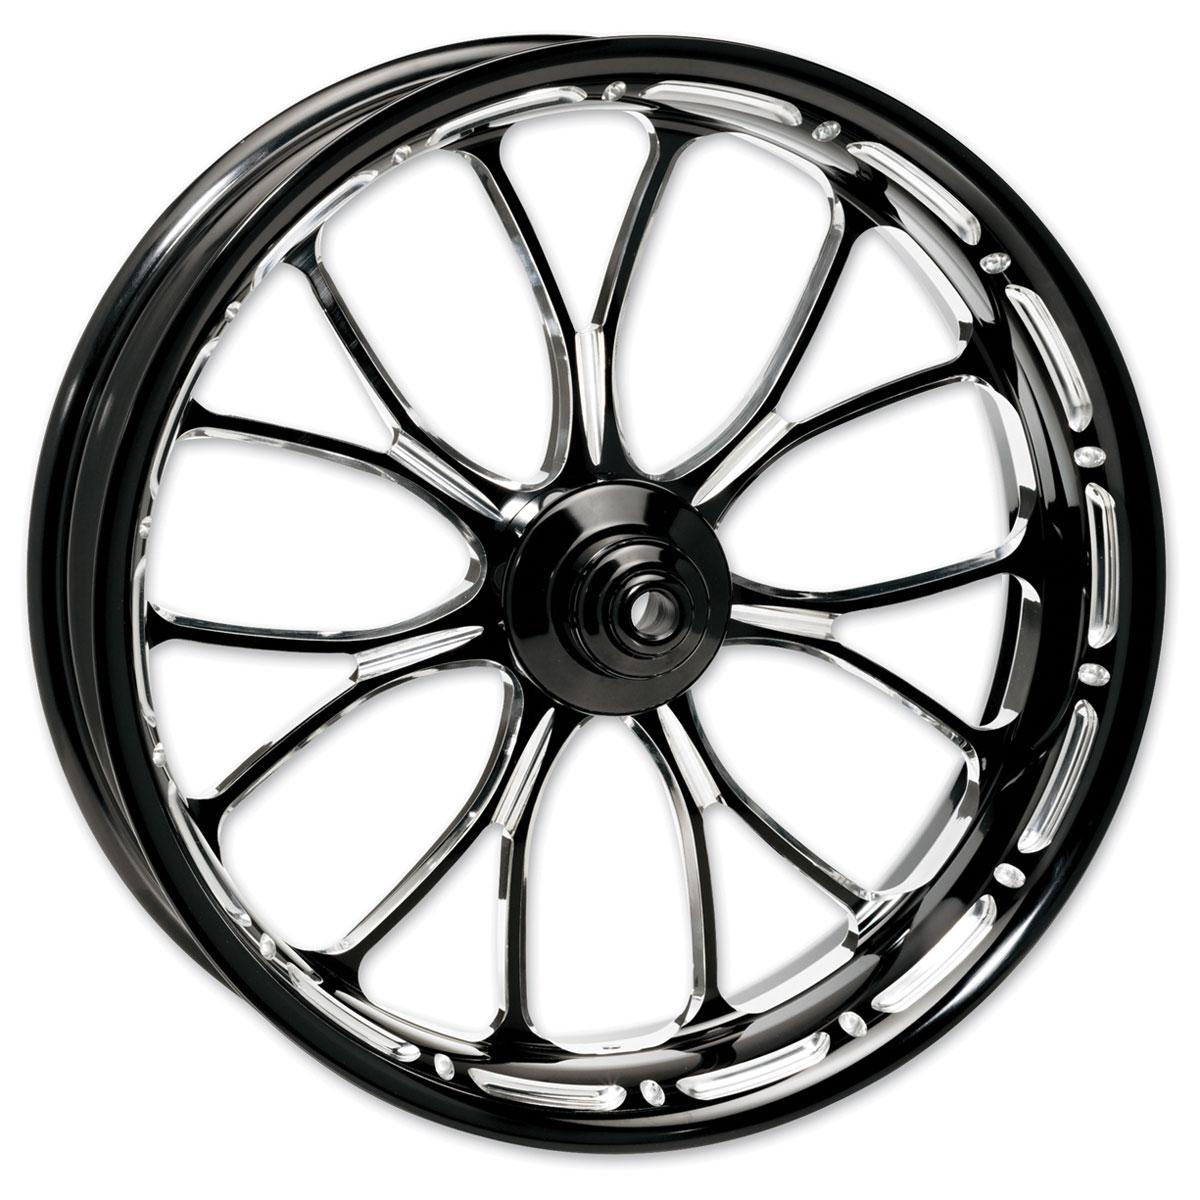 Performance Machine Heathen Platinum Cut Front Wheel 19x3 ABS Dual Disc